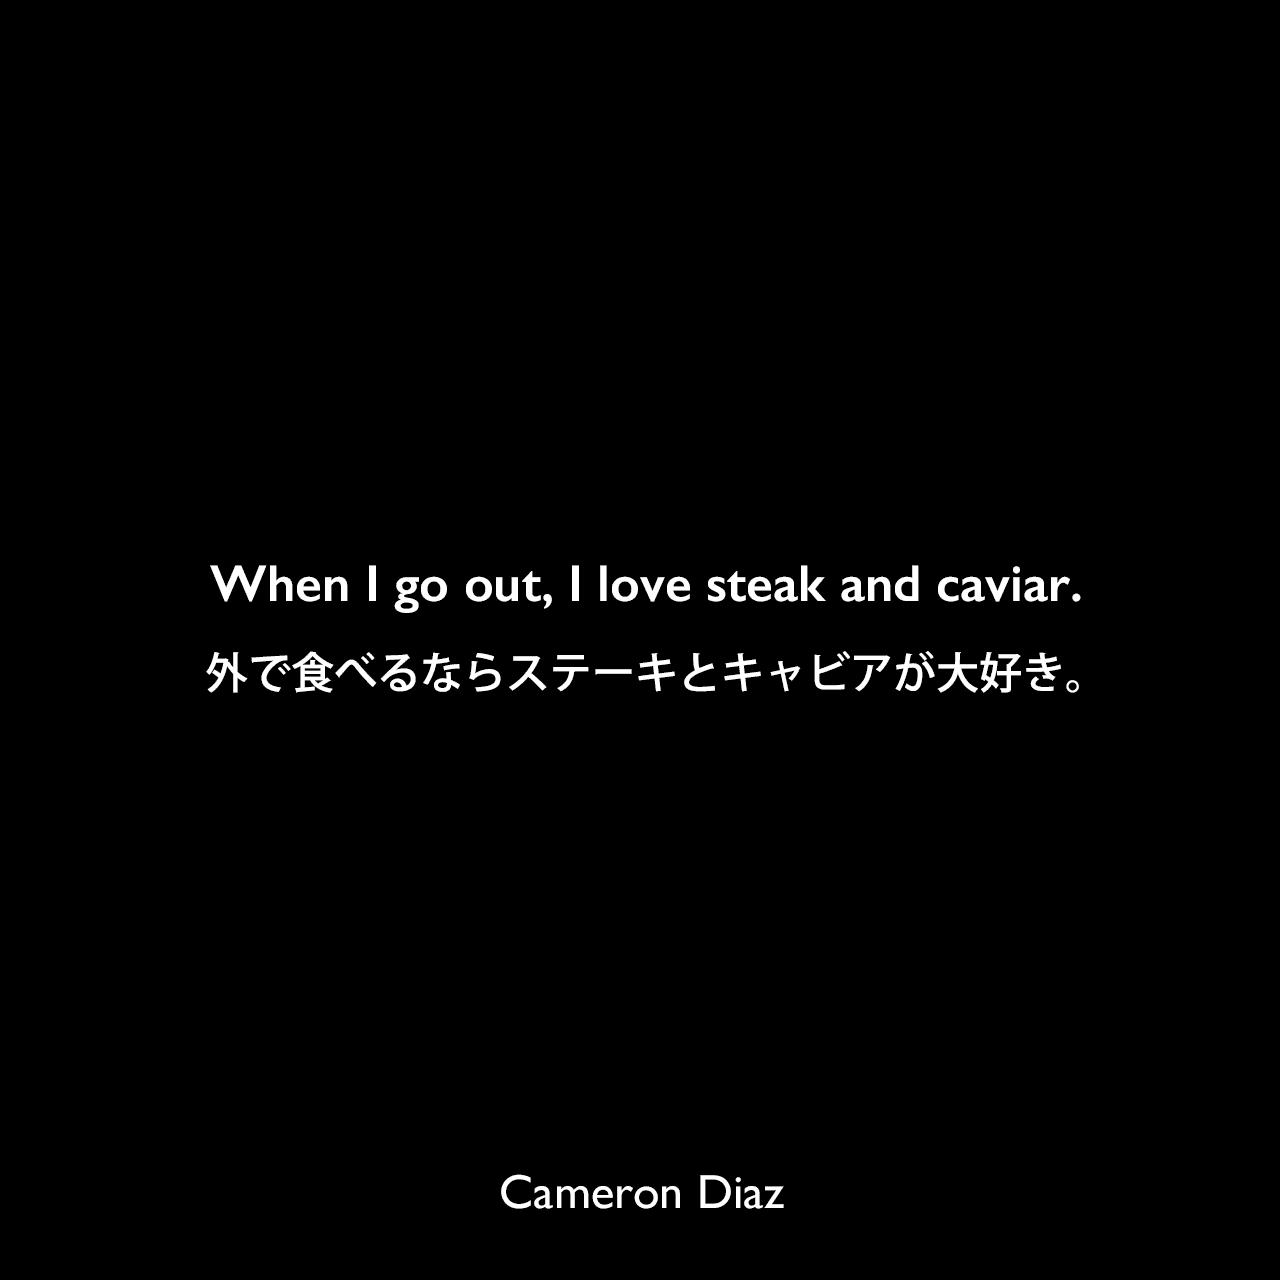 When I go out, I love steak and caviar.外で食べるならステーキとキャビアが大好き。Cameron Diaz